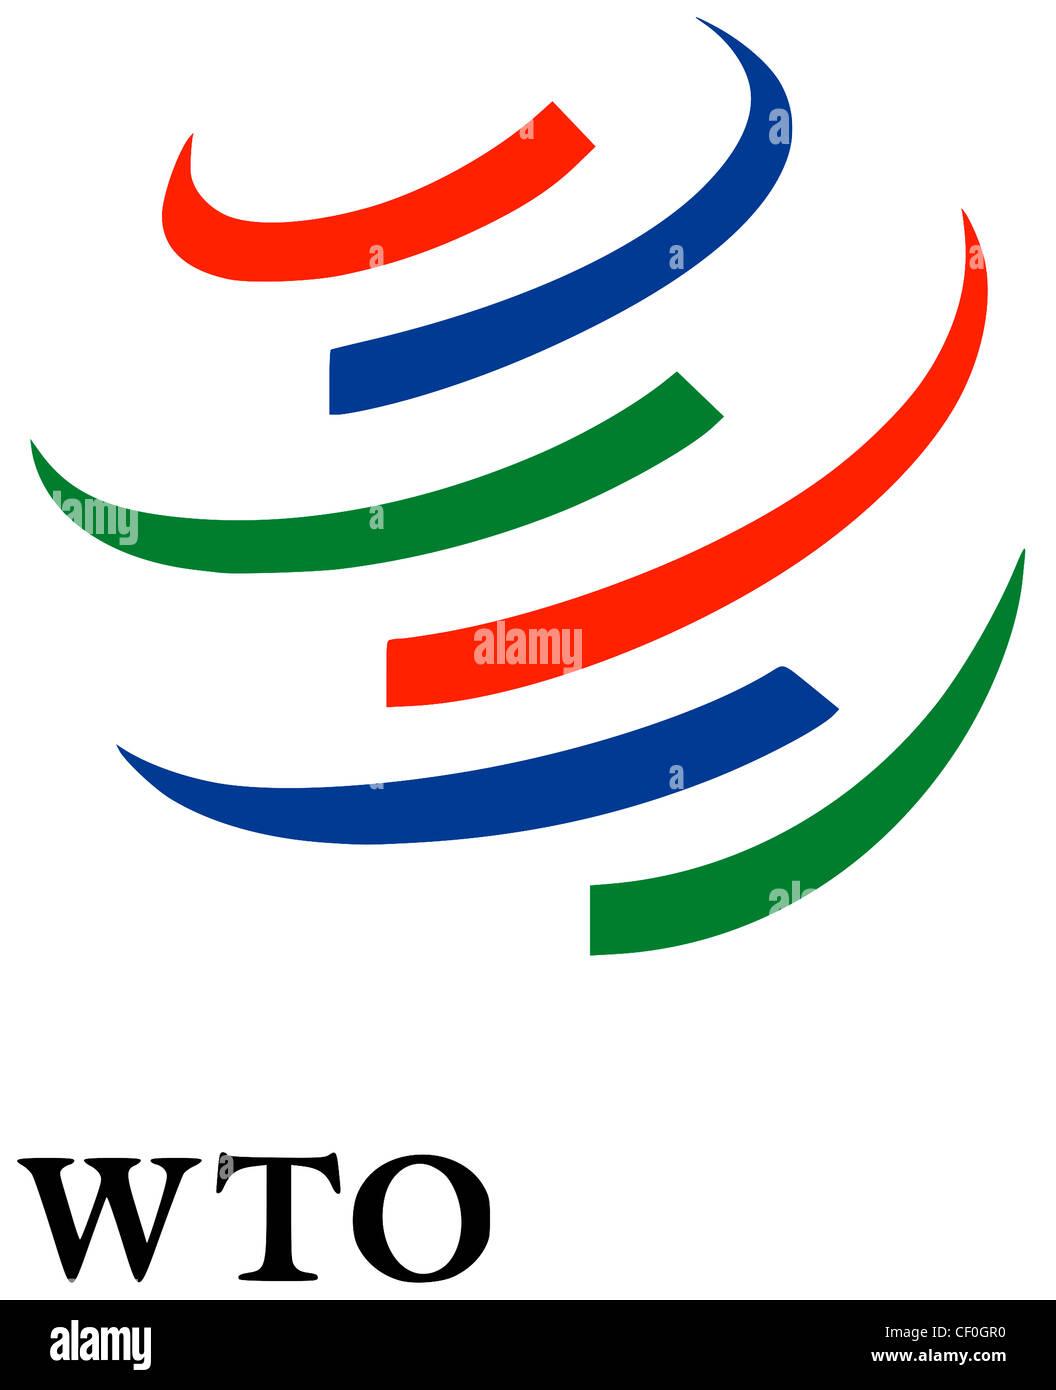 Logo of the World Trade Organization WTO based in Geneva. - Stock Image